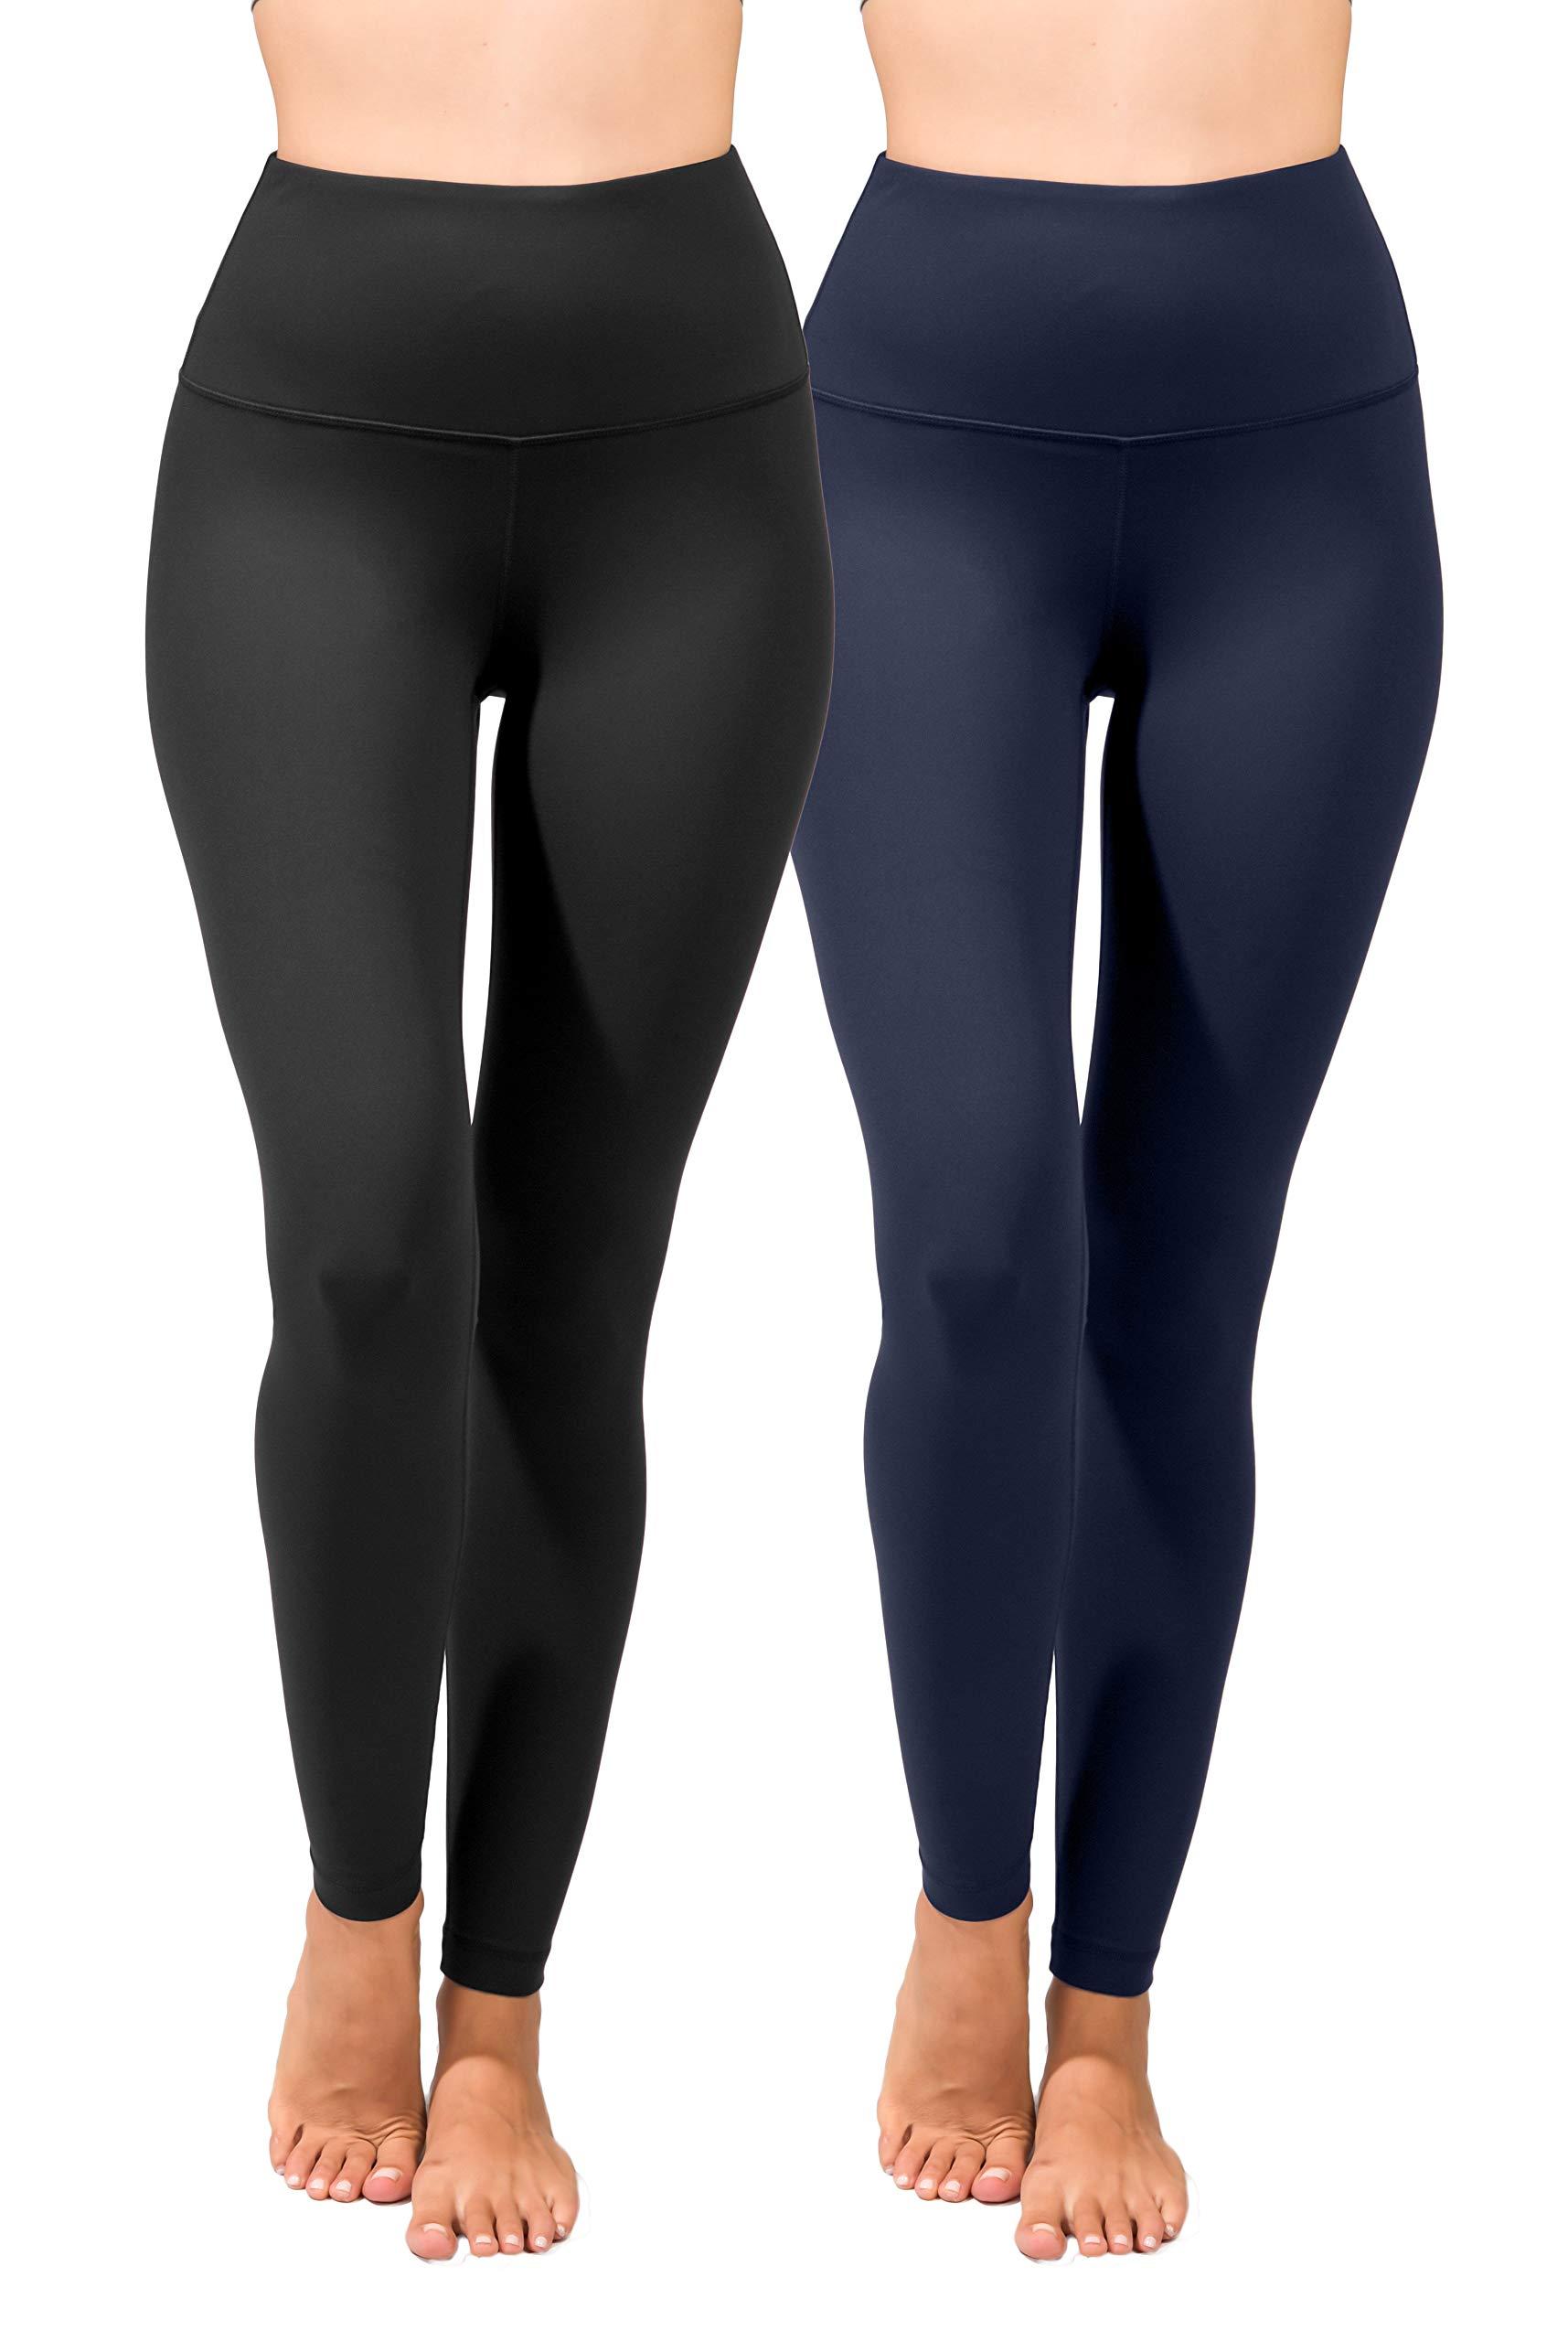 90 Degree By Reflex High Waist Power Flex Legging - Tummy Control - Black & Moonlit Ocean 2 Pack - Medium by 90 Degree By Reflex